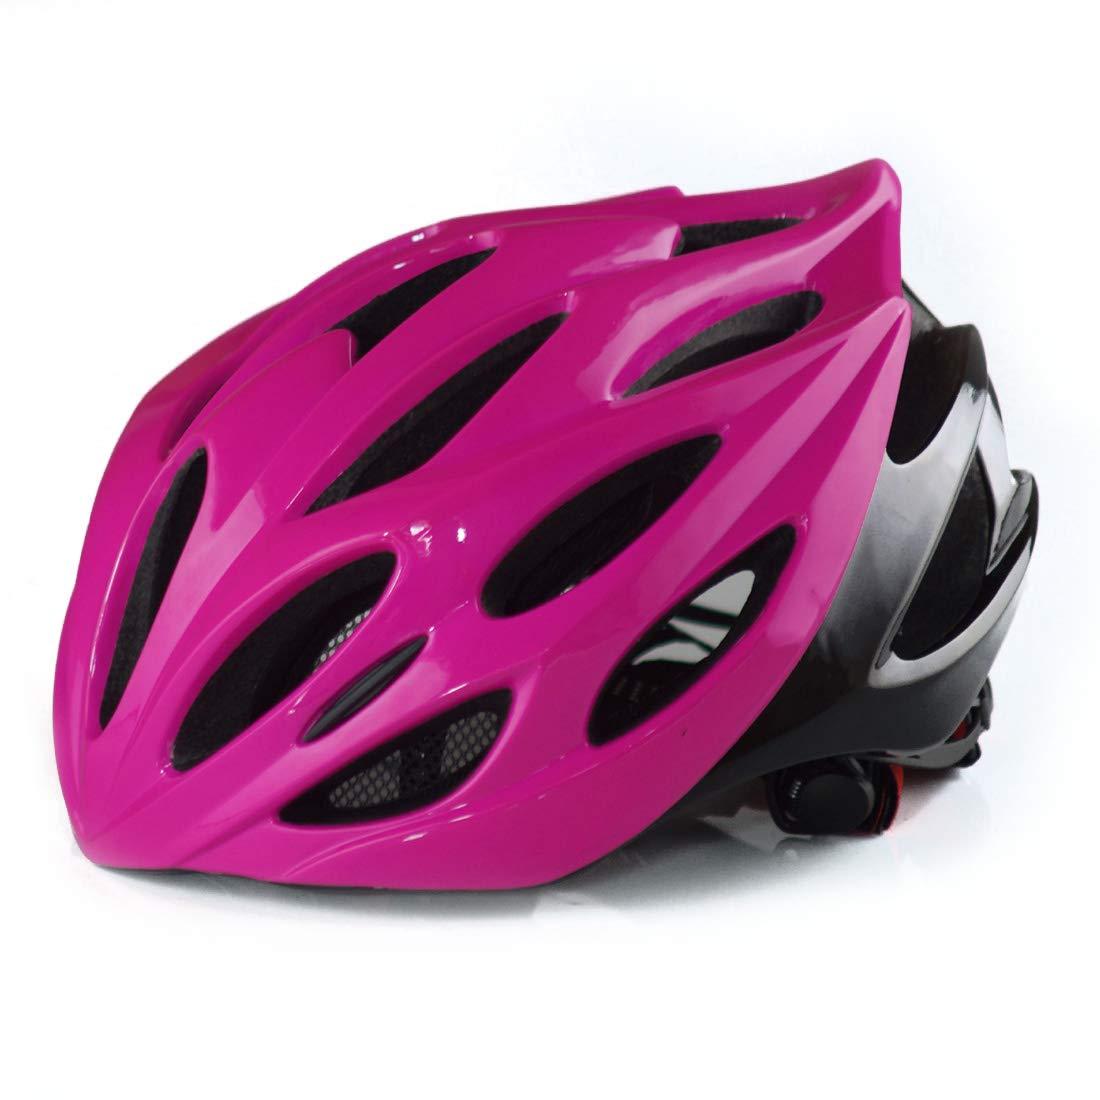 Nekovan 屋外自転車愛好家に適した自転車安全ヘルメット自転車乗馬ヘルメット (Color : A4, サイズ : L) Large A4 B07QHSKC7F